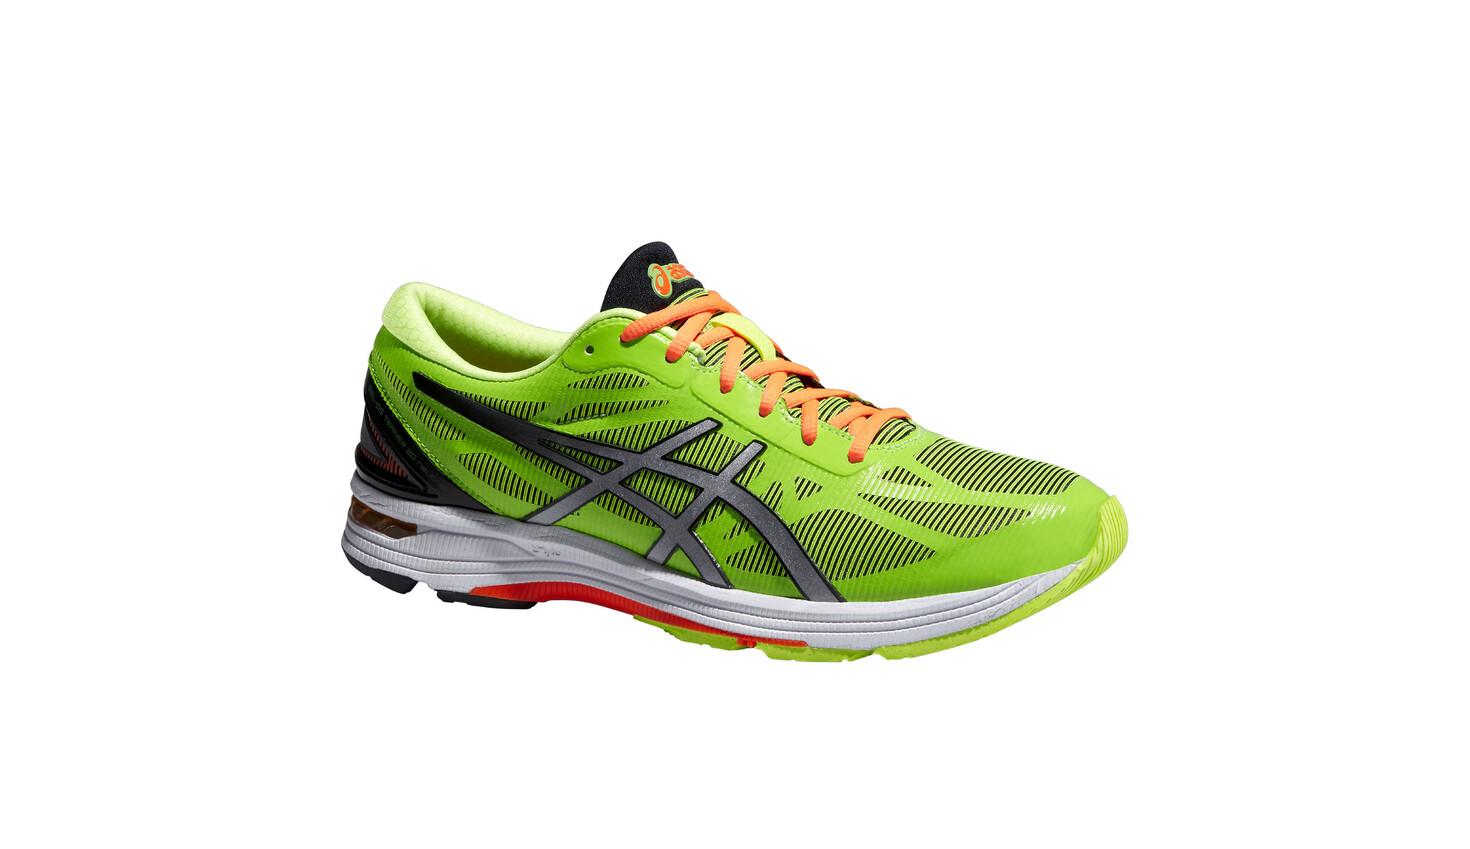 Giày Hiệu  : Lacoste, Timberland, Nike, Adidas, Kappa, Clarks.. - 1